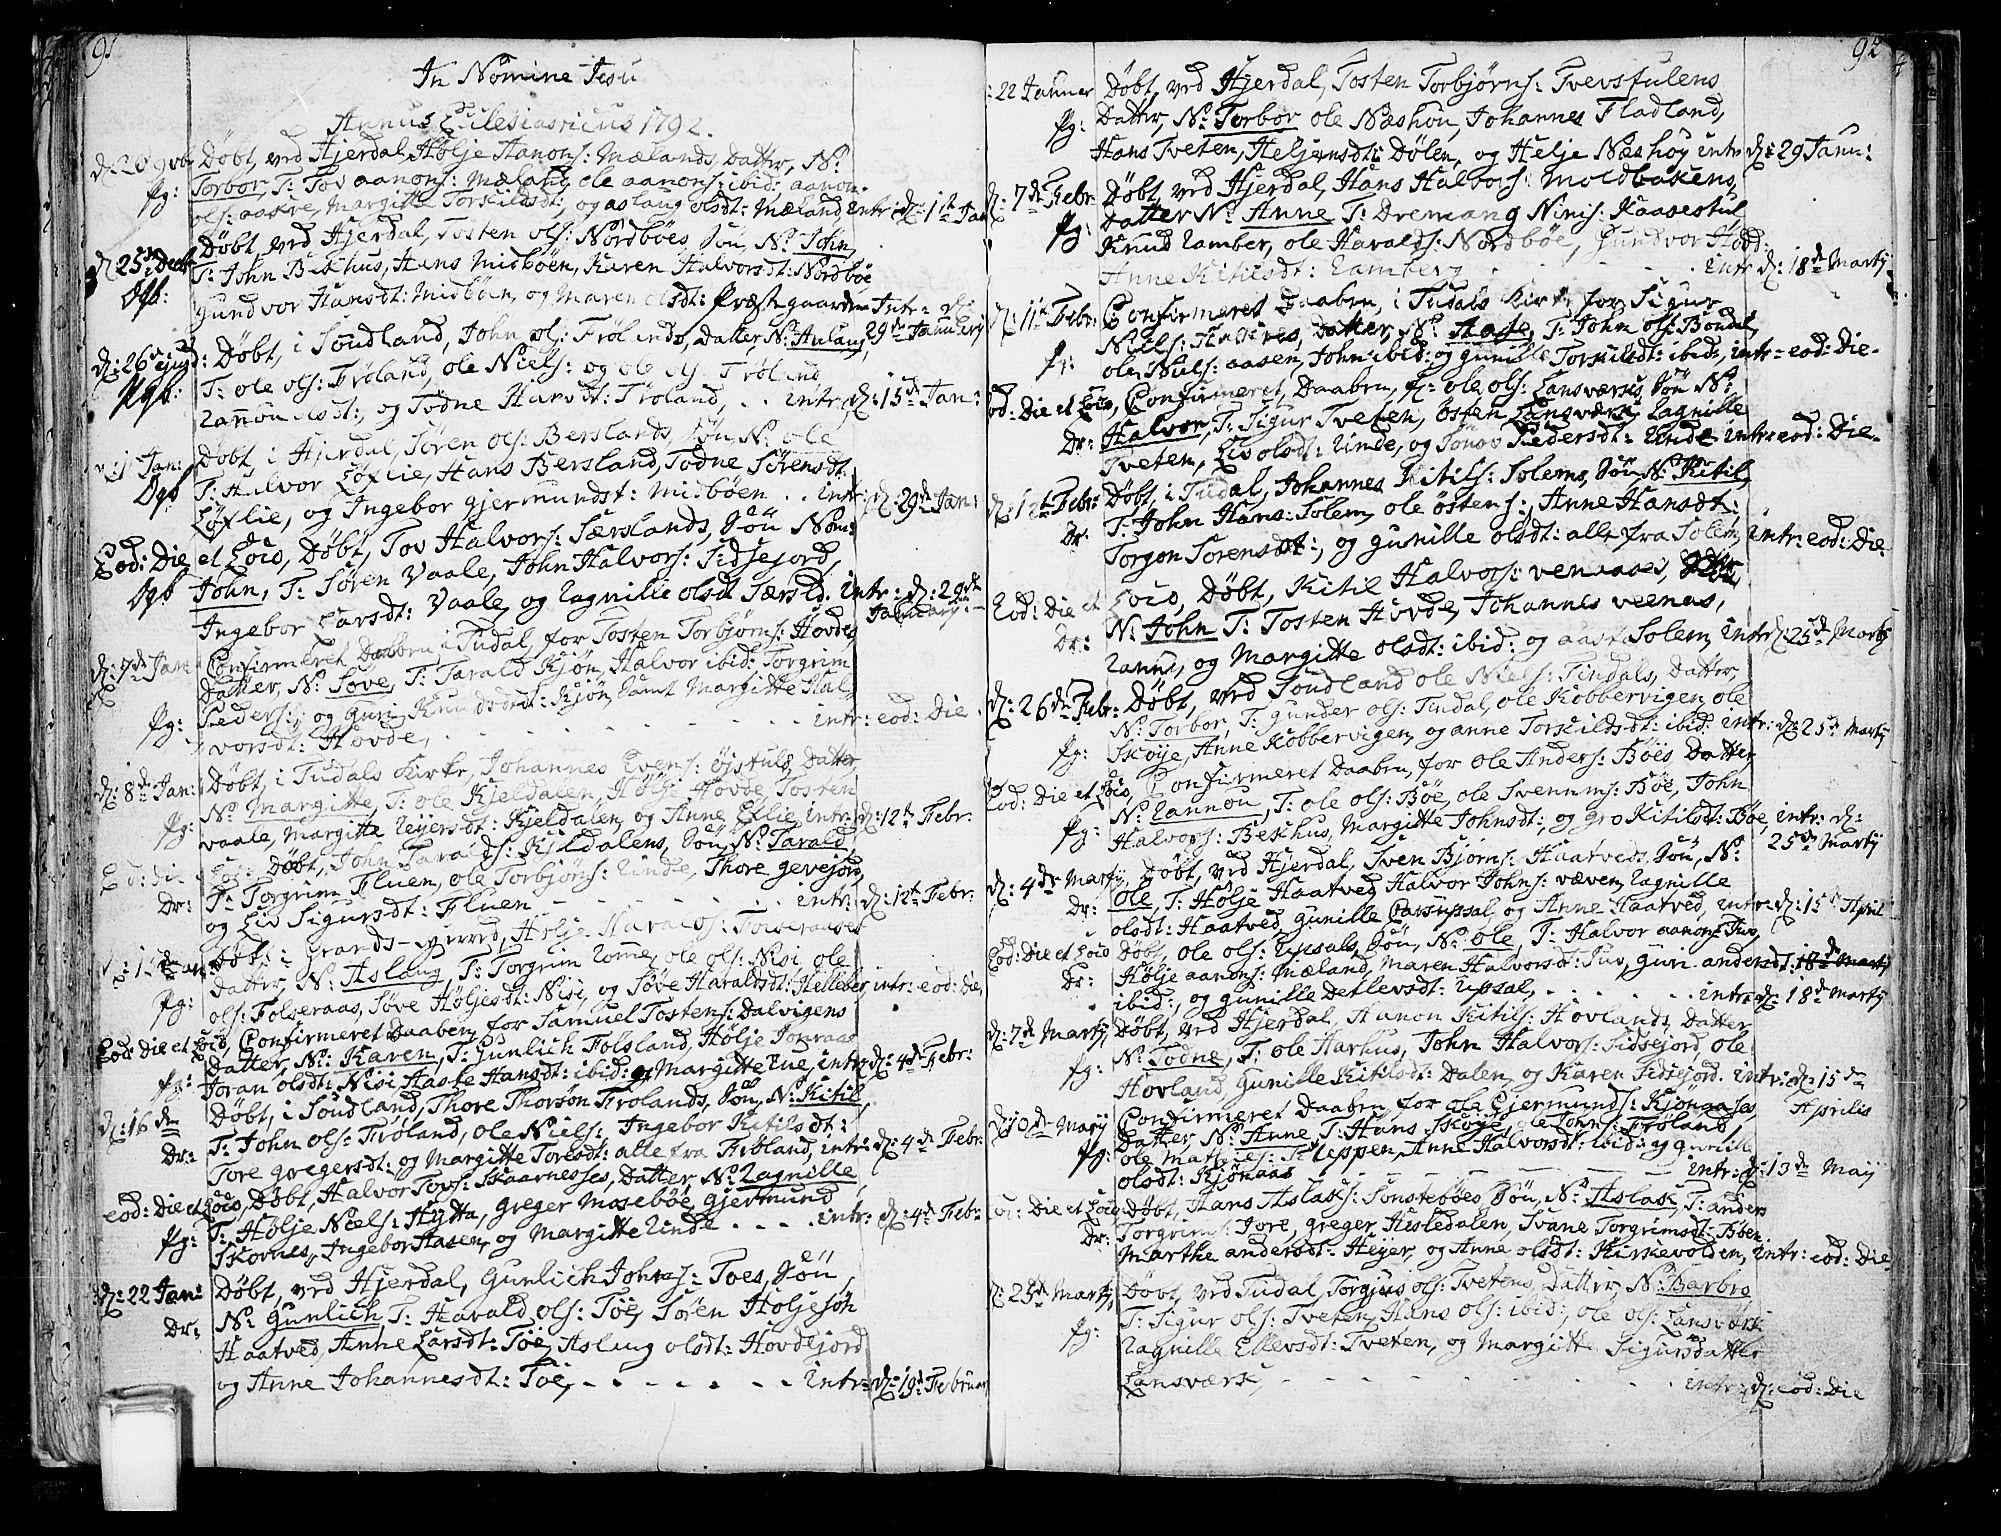 SAKO, Hjartdal kirkebøker, F/Fa/L0005: Ministerialbok nr. I 5, 1776-1801, s. 91-92